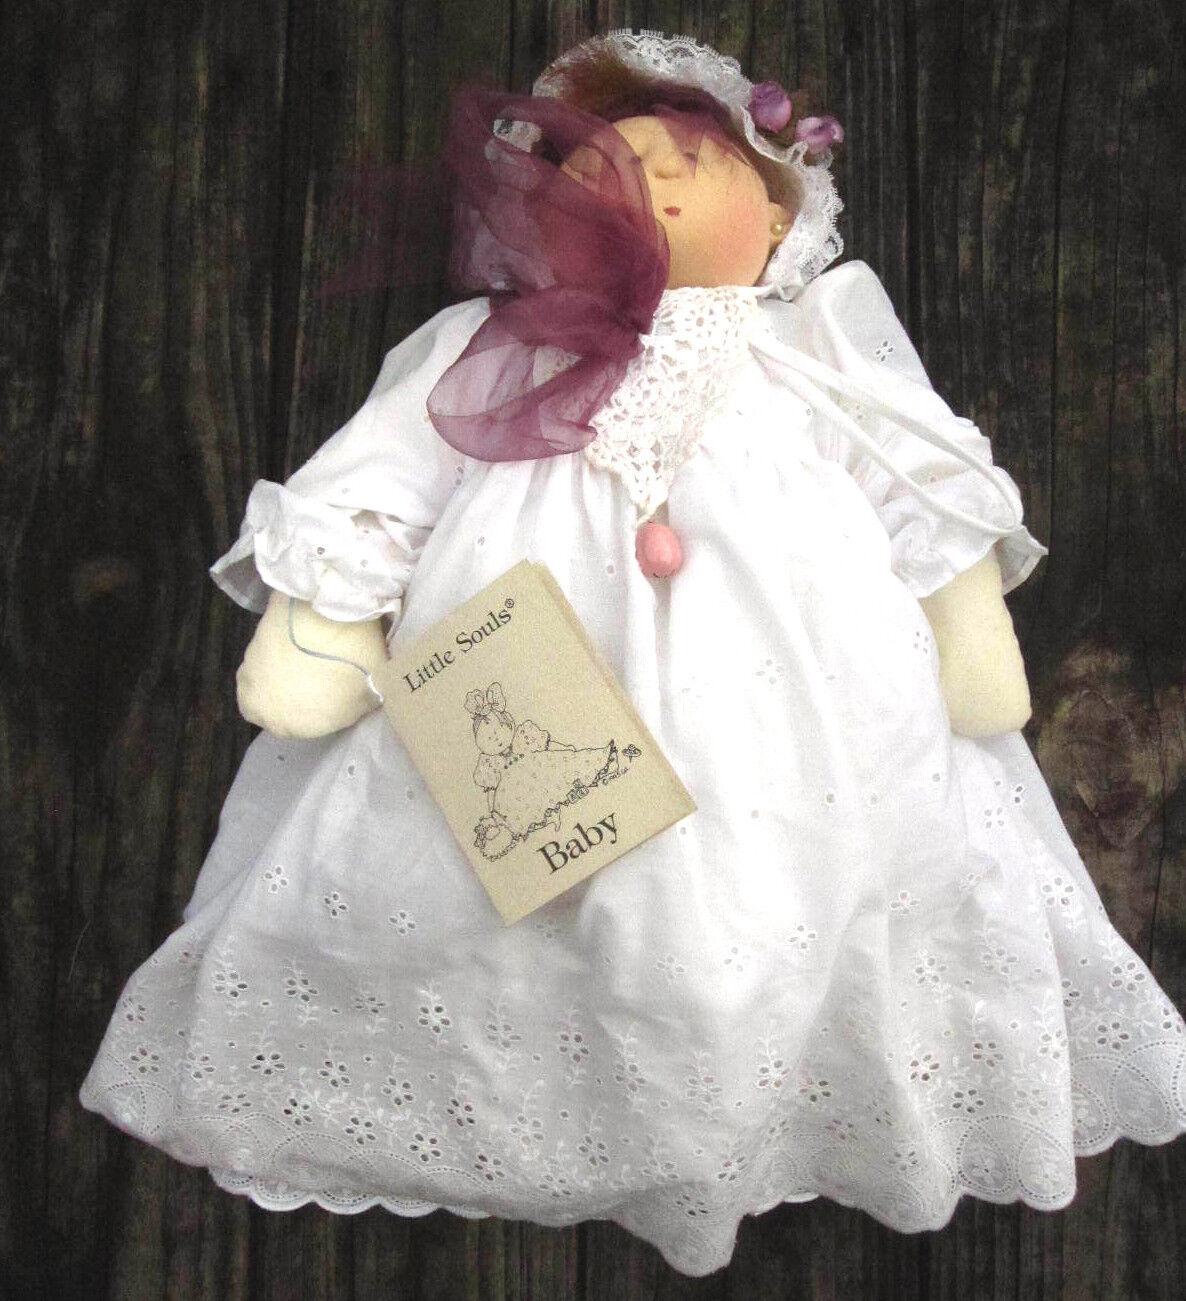 Gretchen Wilson LITTLE SOULS Soft Sculpture Infant Doll 1995 Artist Signed